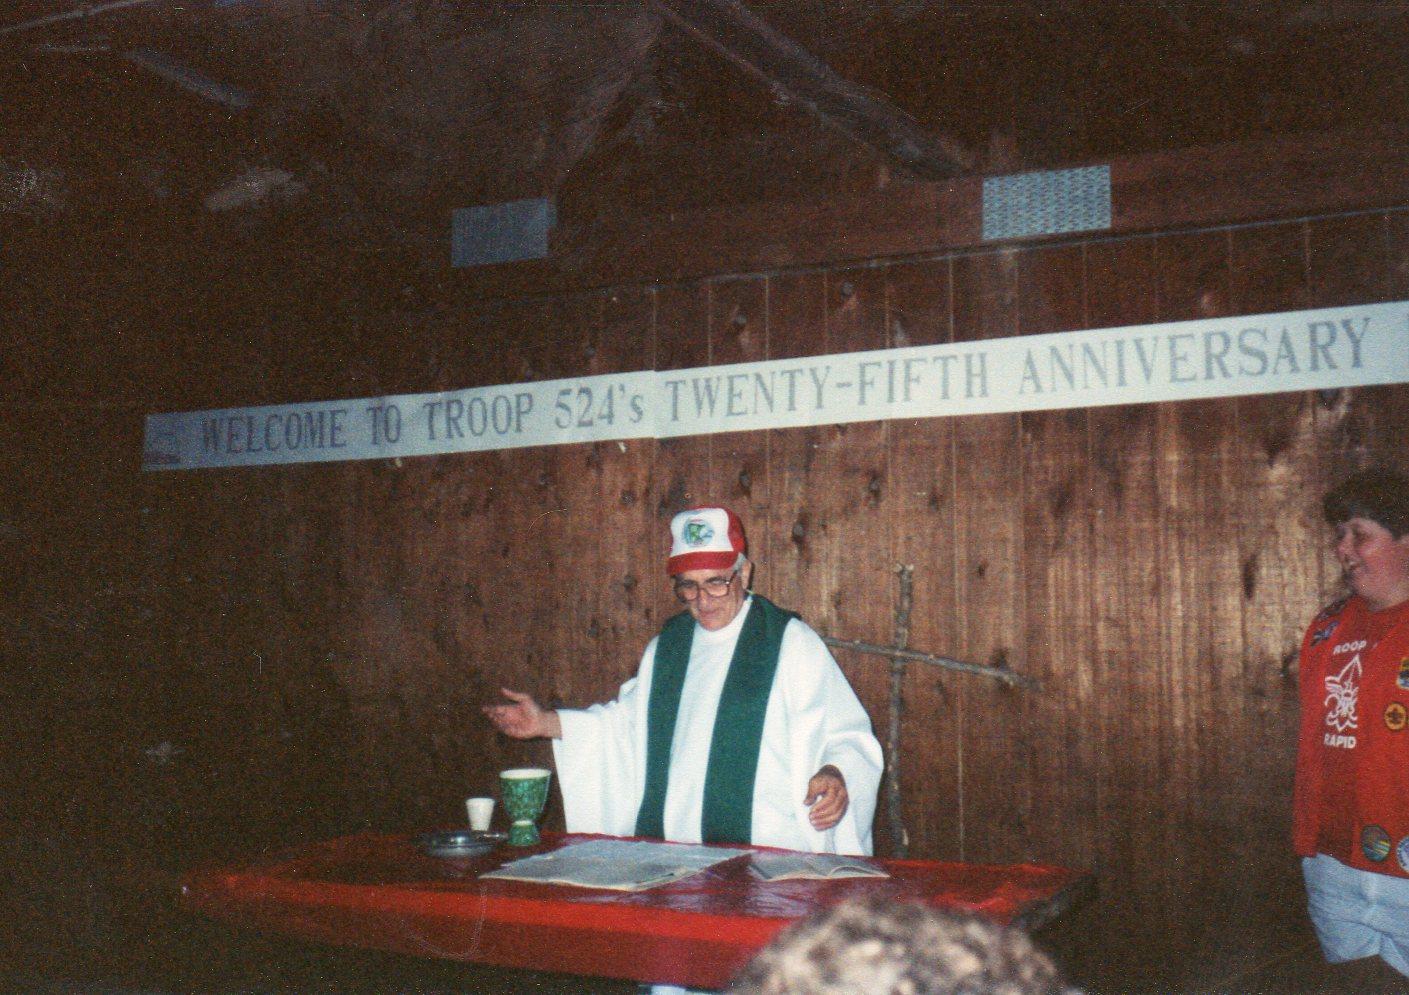 1989-25th Anniversary